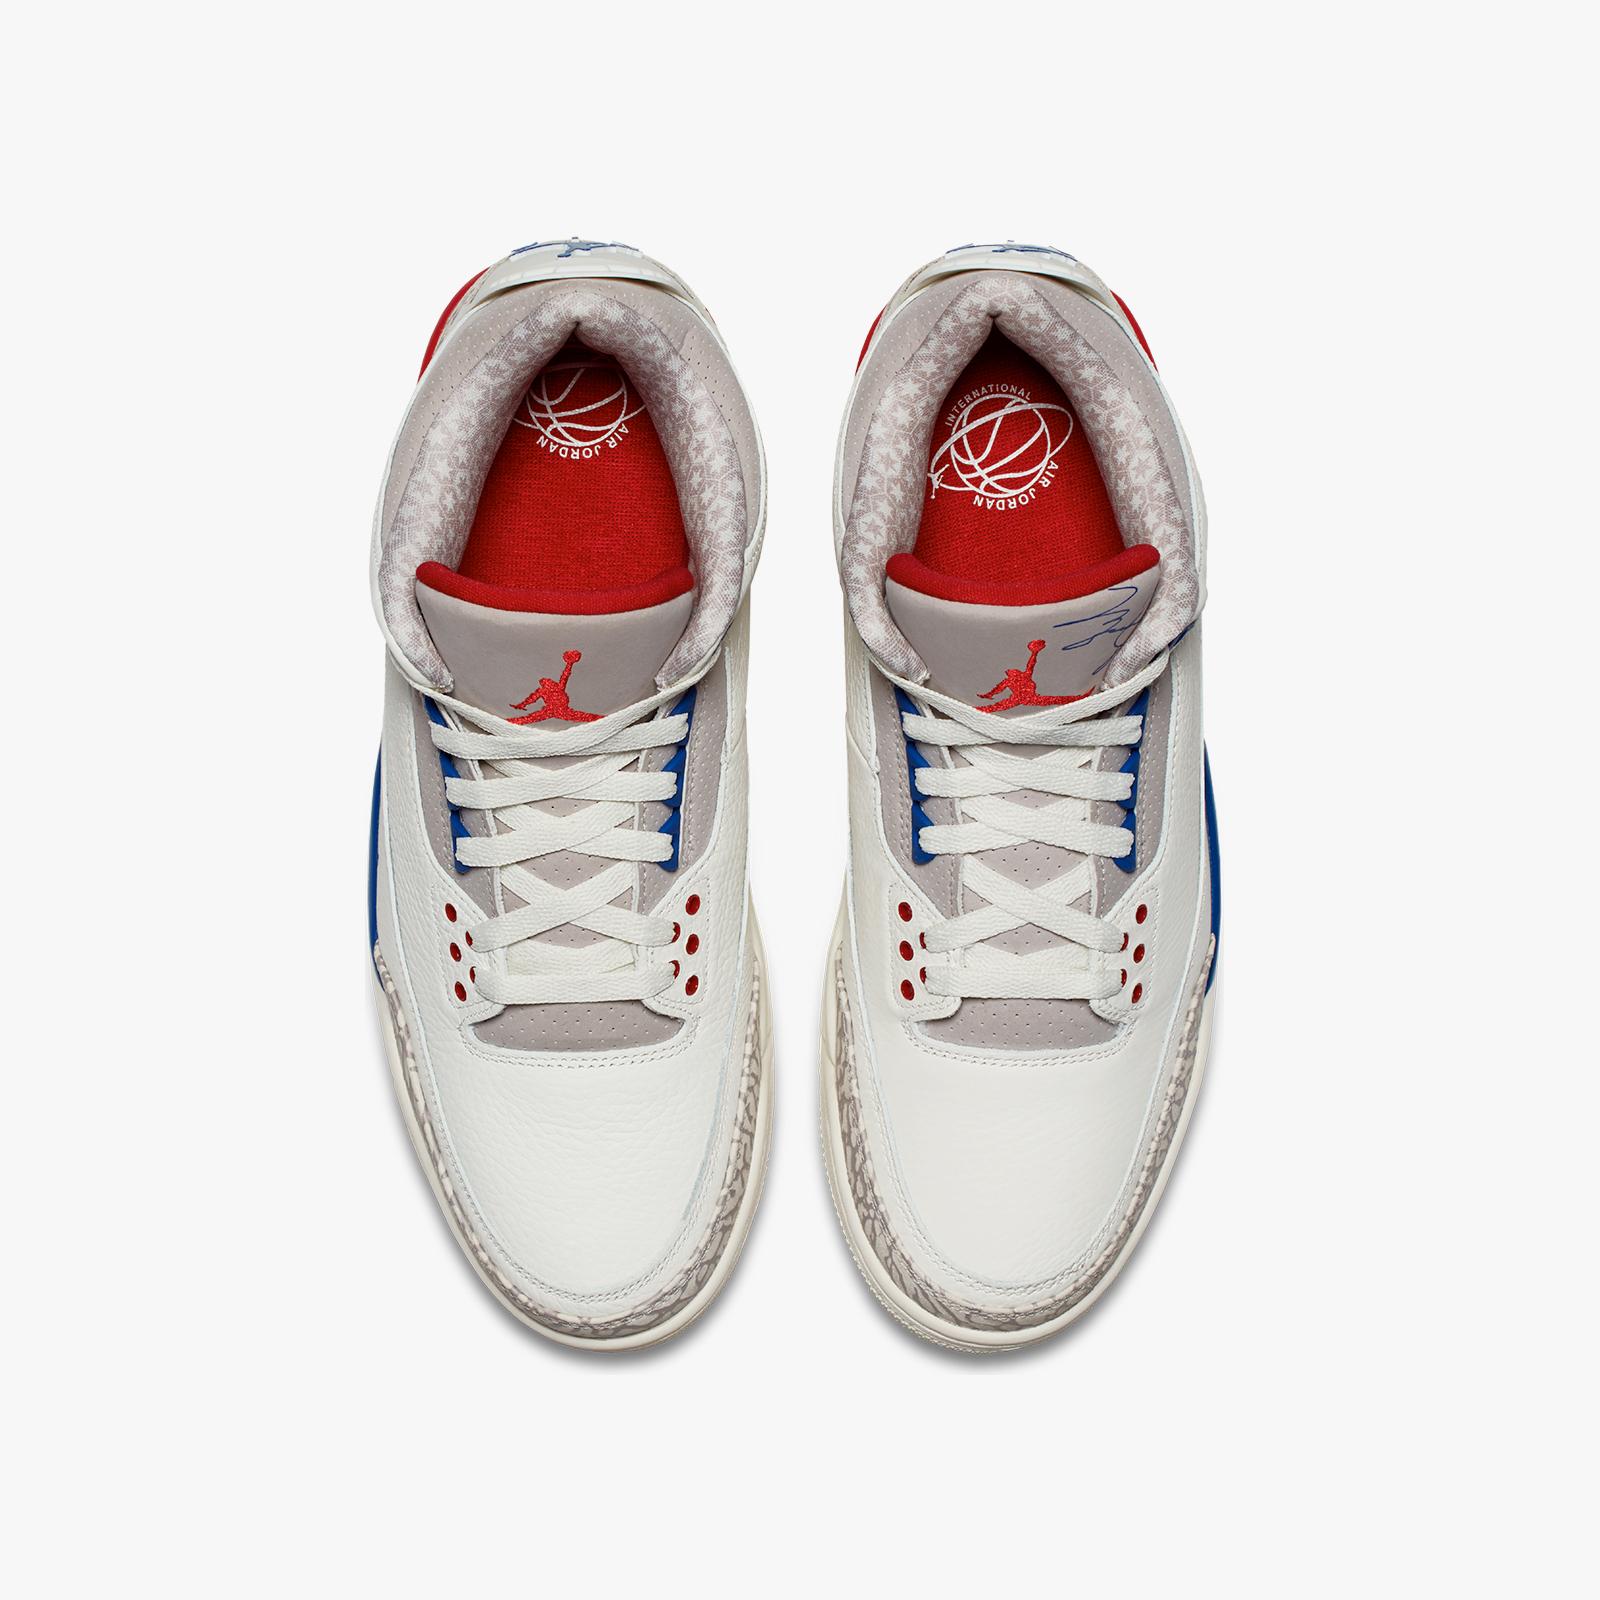 5c603a90056 Jordan Brand Air Jordan 3 Retro - 136064-140 - Sneakersnstuff ...